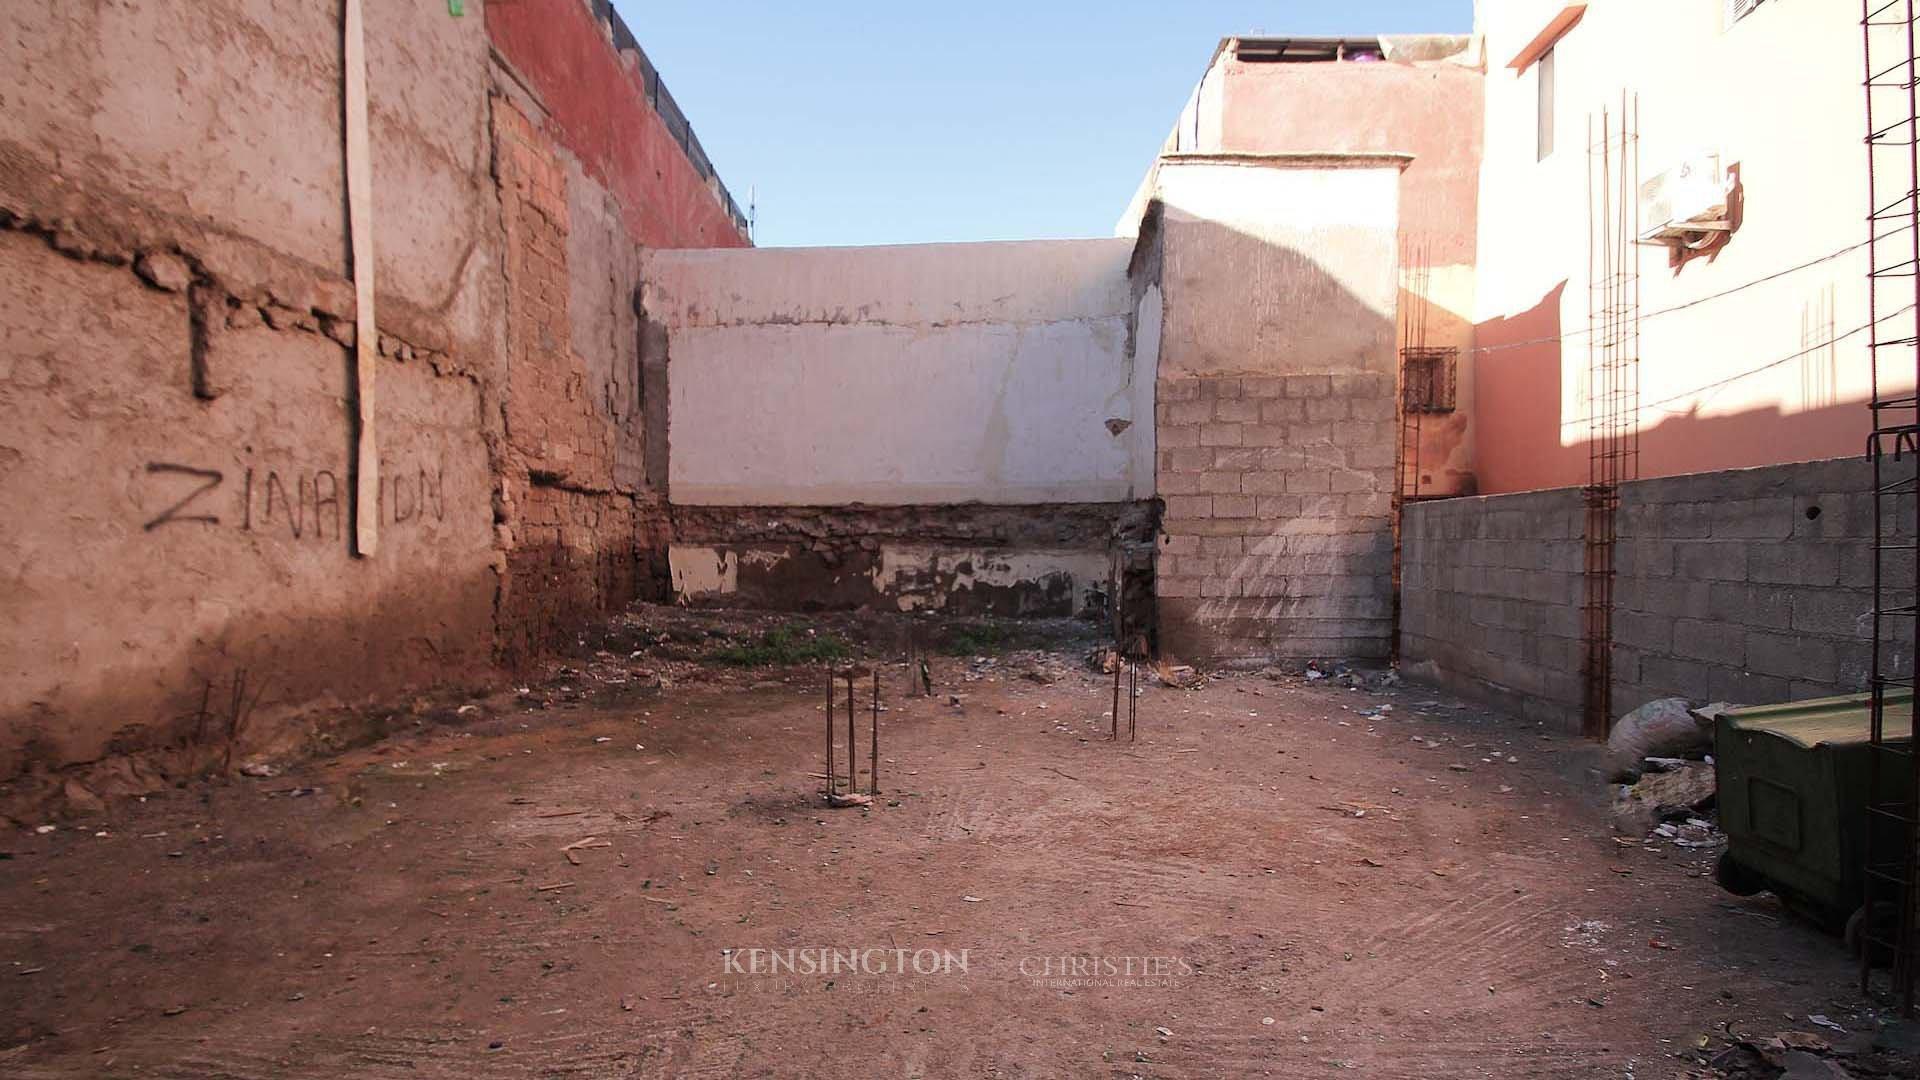 KPPM01133: Terrains Rahala Terrain constructible Marrakech Maroc